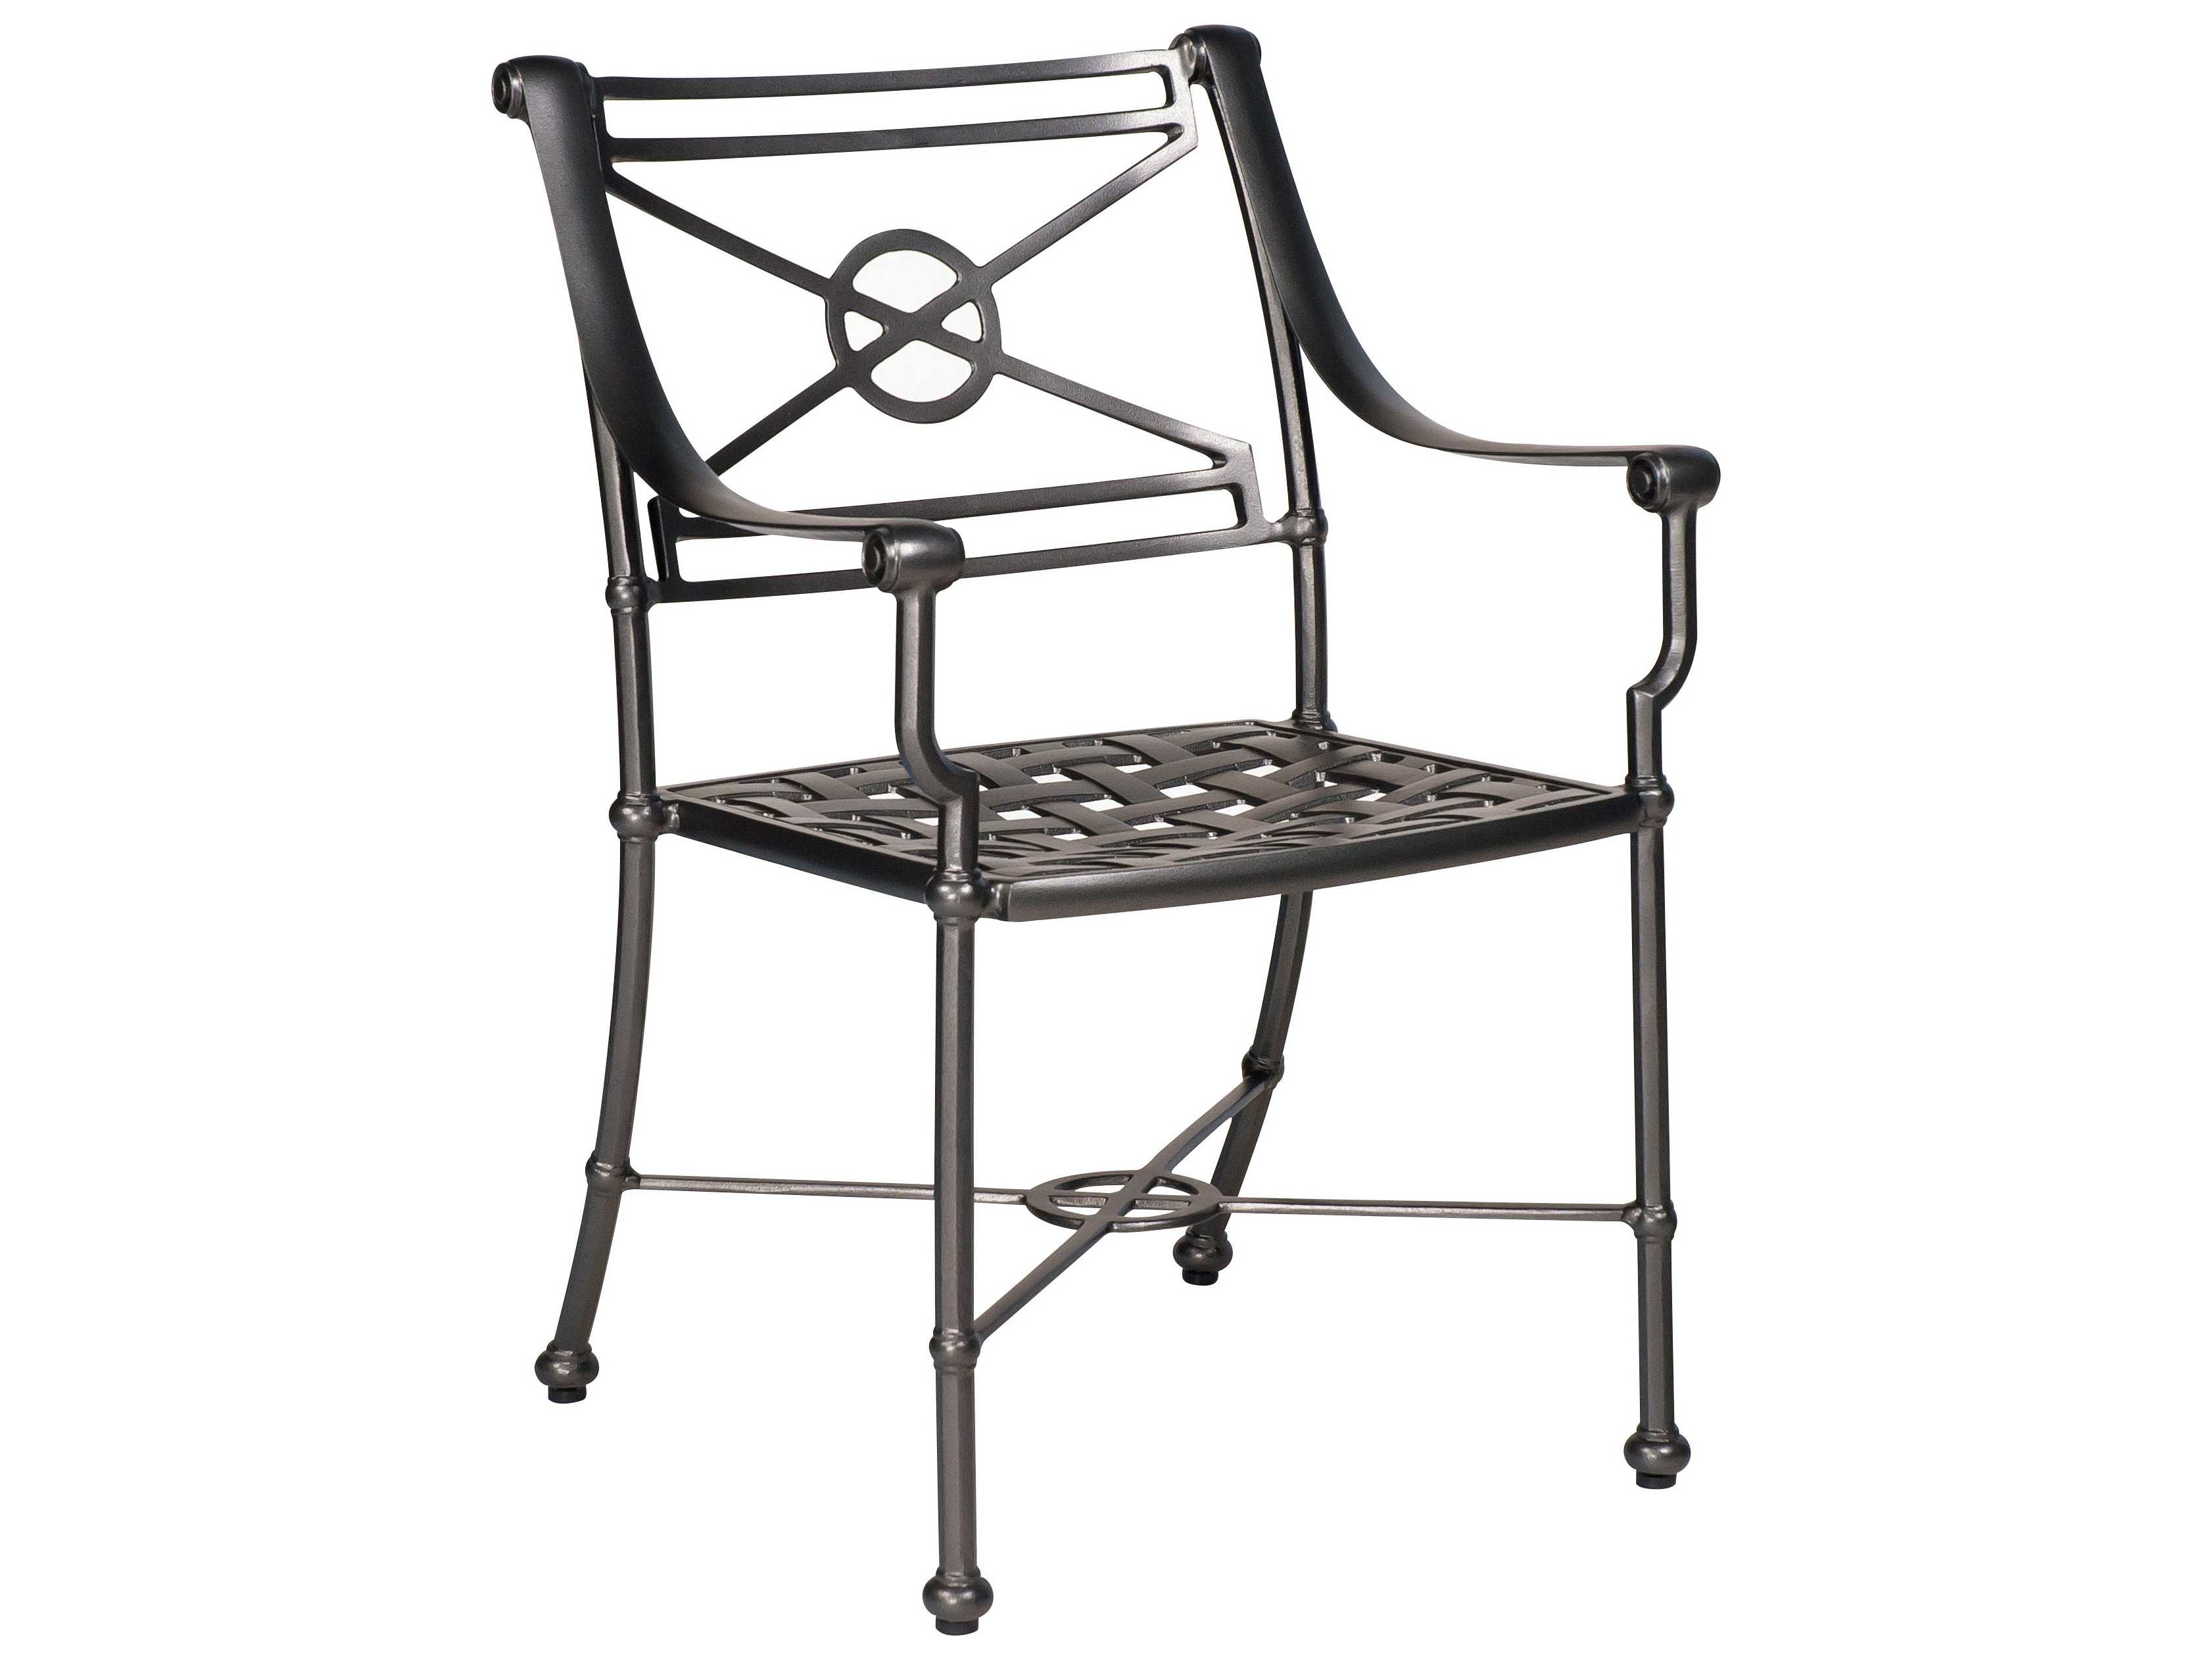 Woodard Delphi Cast Aluminum Dining Chair